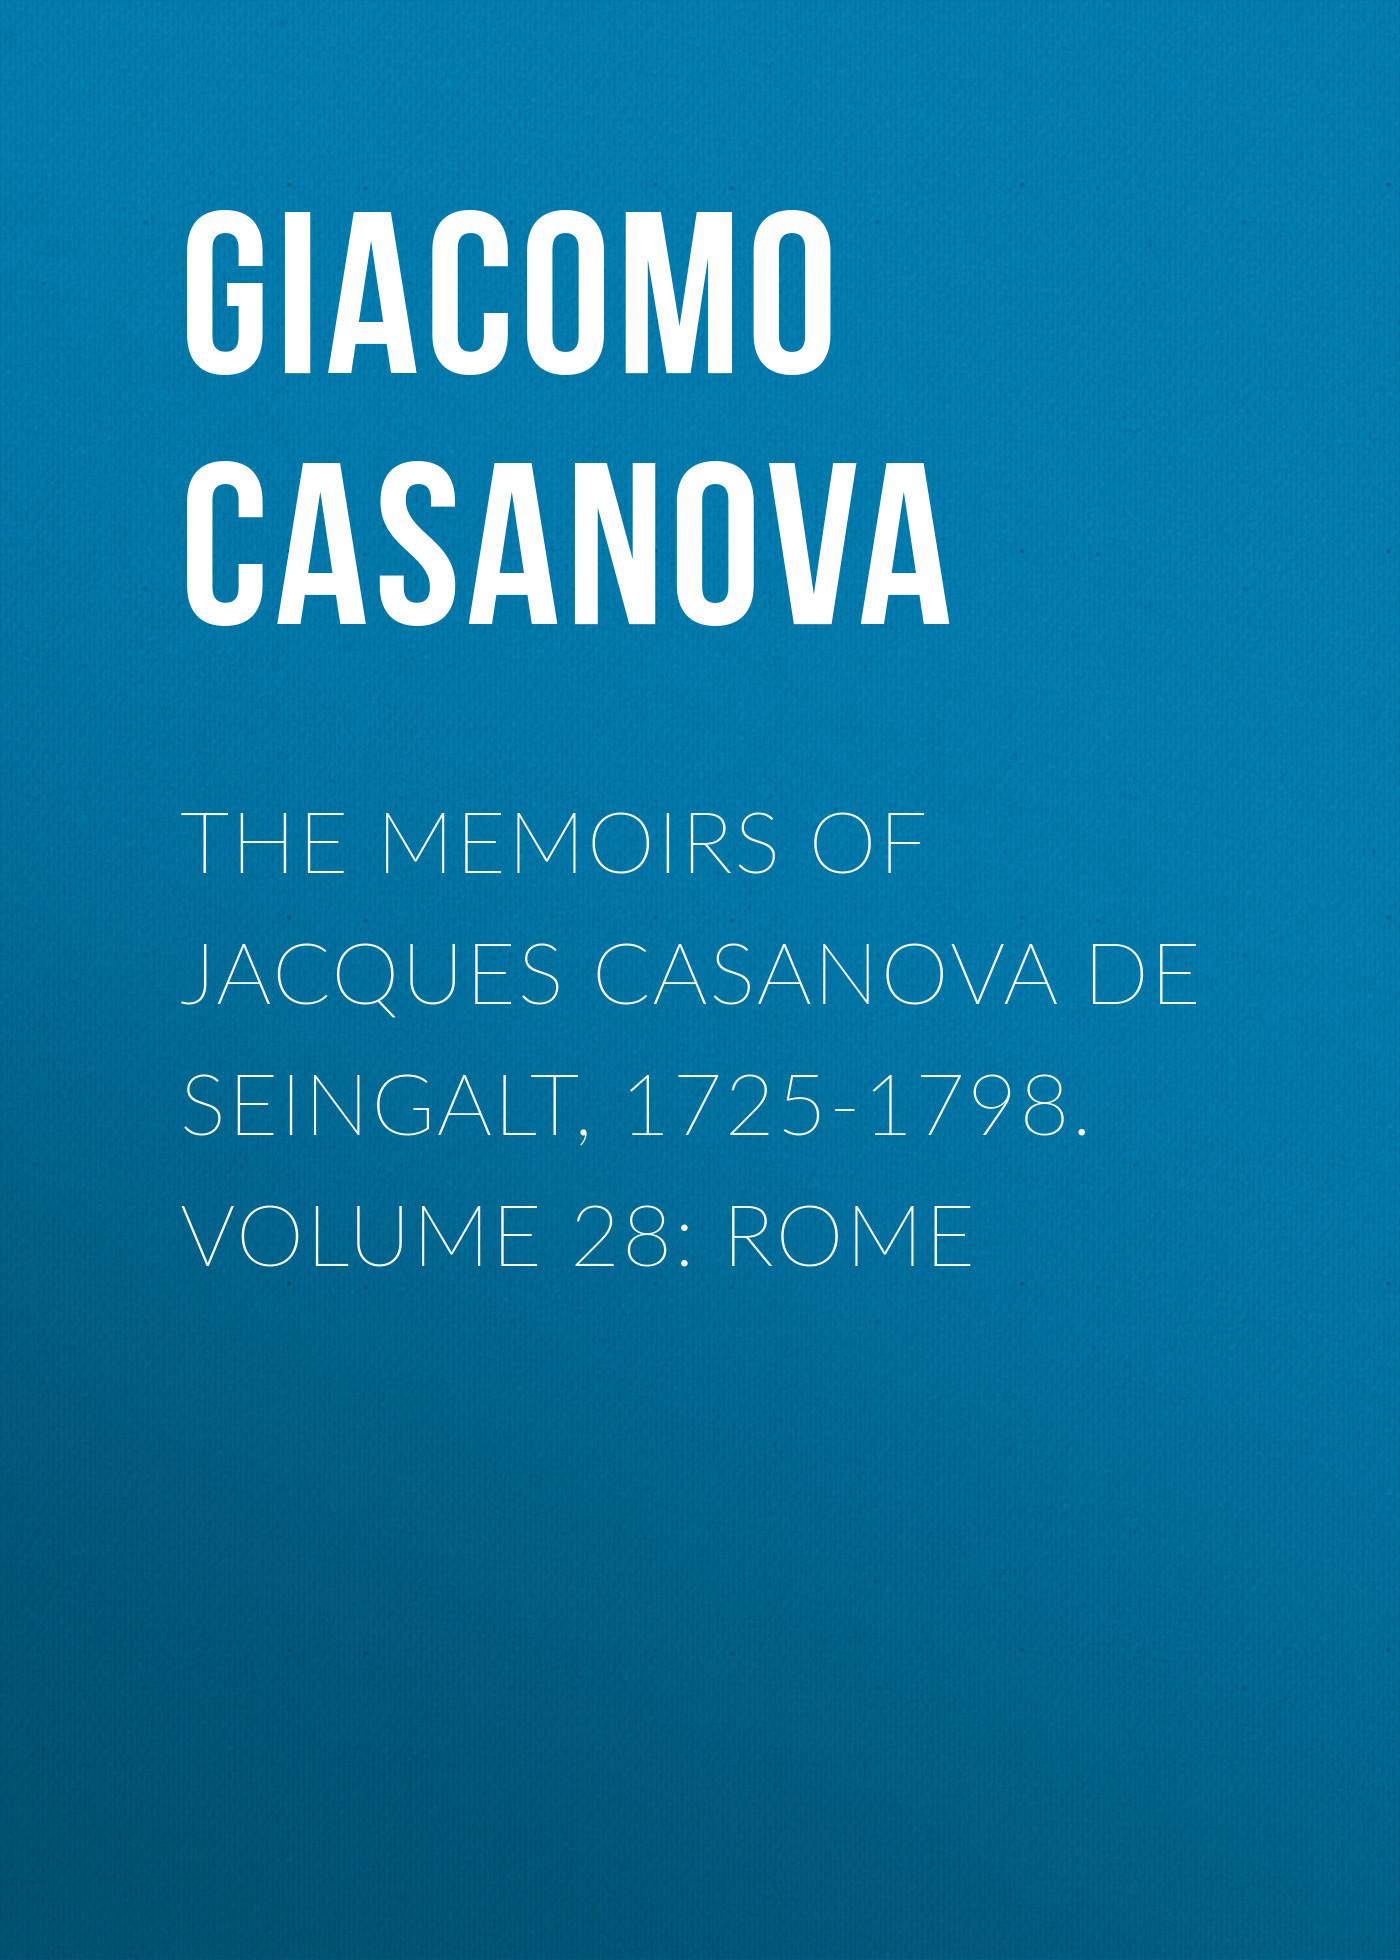 Giacomo Casanova The Memoirs of Jacques Casanova de Seingalt, 1725-1798. Volume 28: Rome giacomo casanova the memoirs of jacques casanova de seingalt 1725 1798 volume 17 return to italy